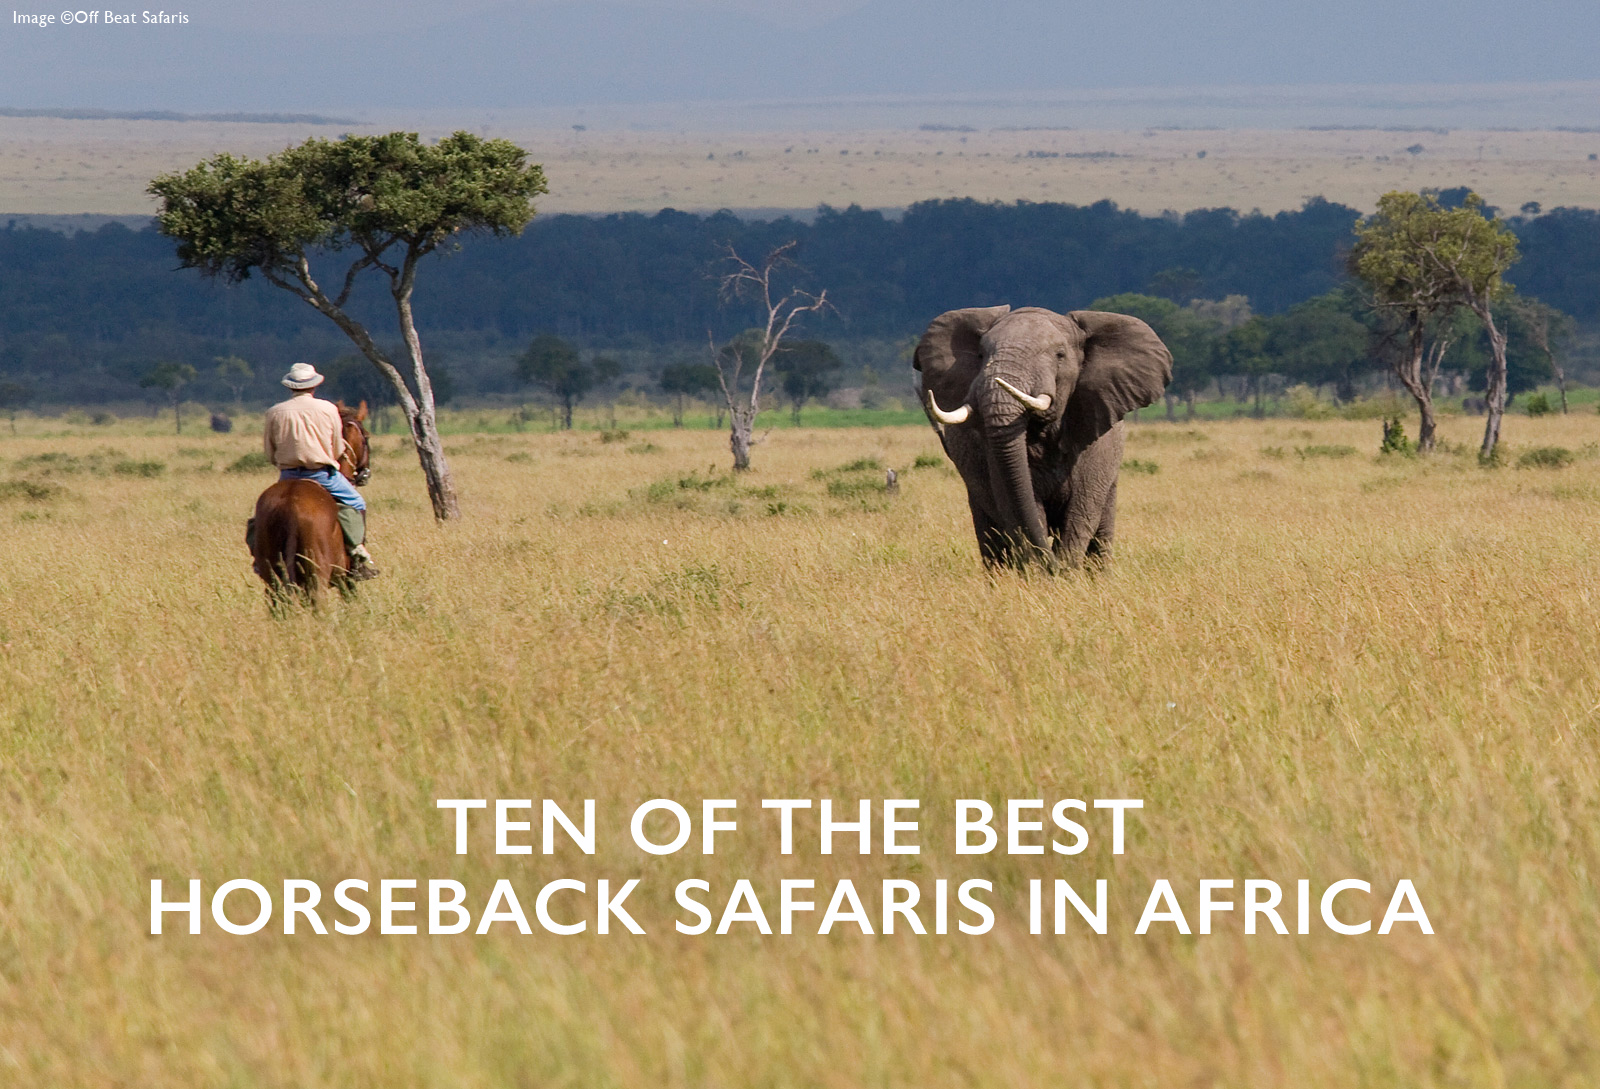 Of The Best Horseback Safaris In Africa Africa Geographic - 10 best safaris in africa